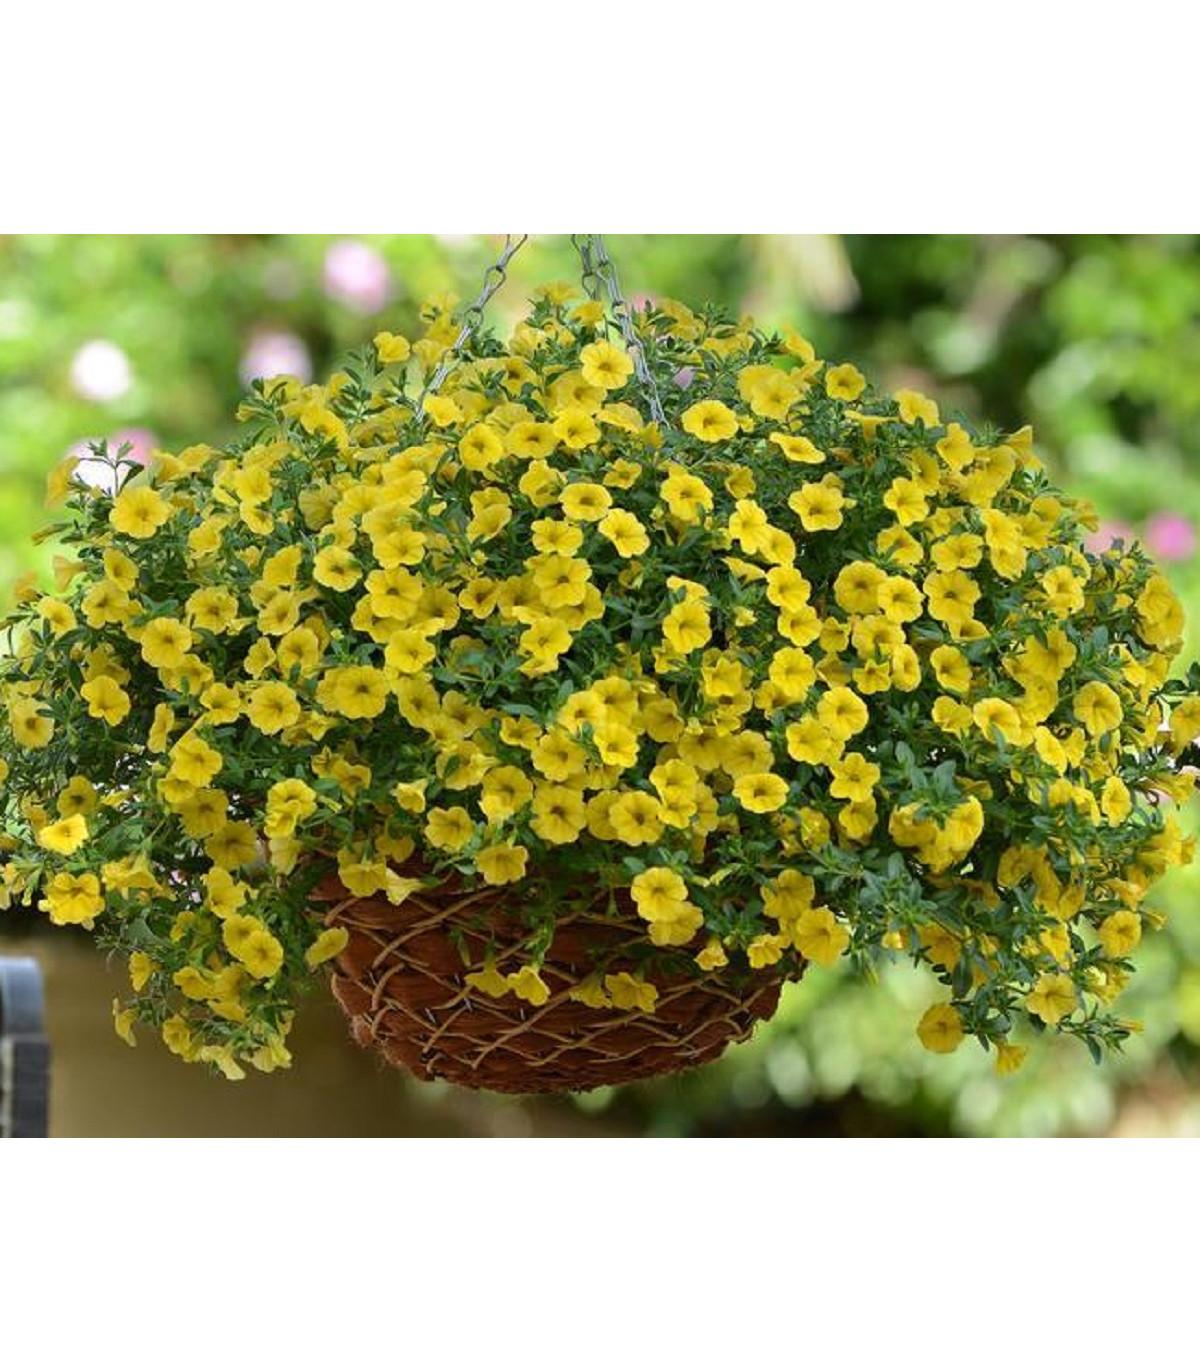 Minipetúnie - Calibrachoa hybrida - Kabloom Yellow  F1 - milionbells - 7 ks